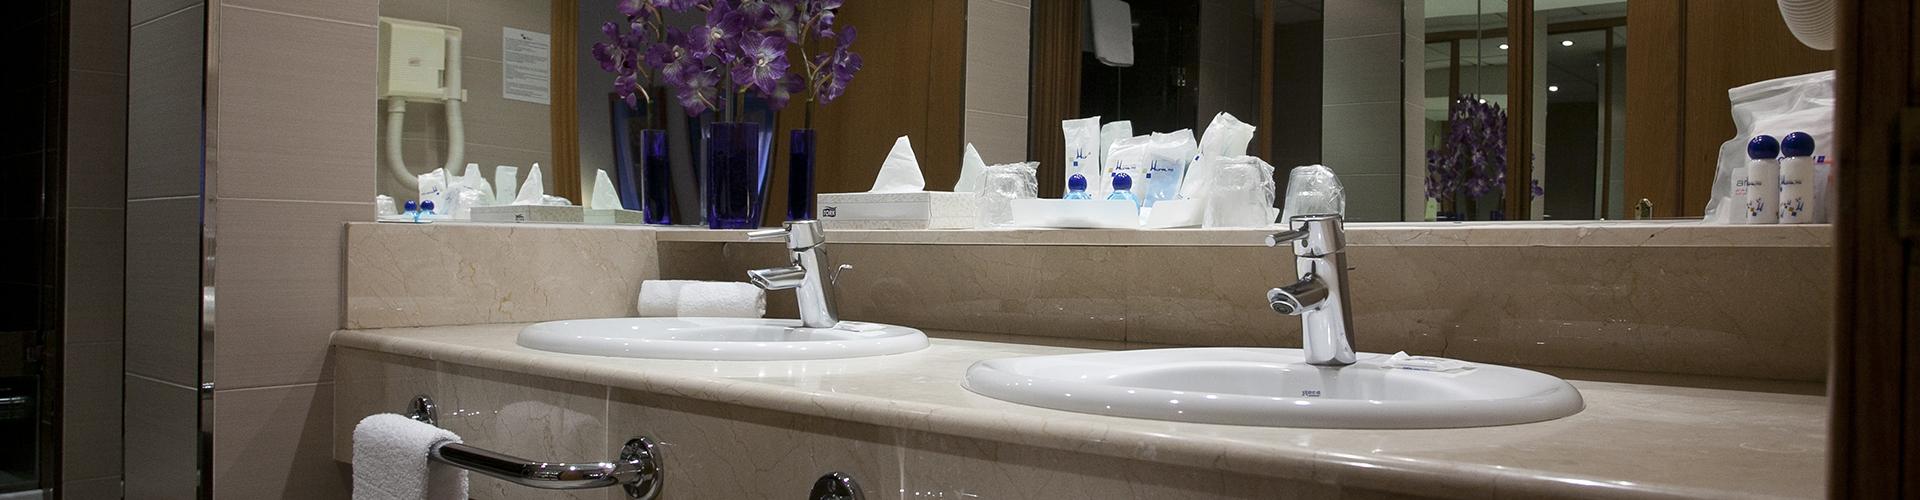 Baño apartamento recorte 1920×500